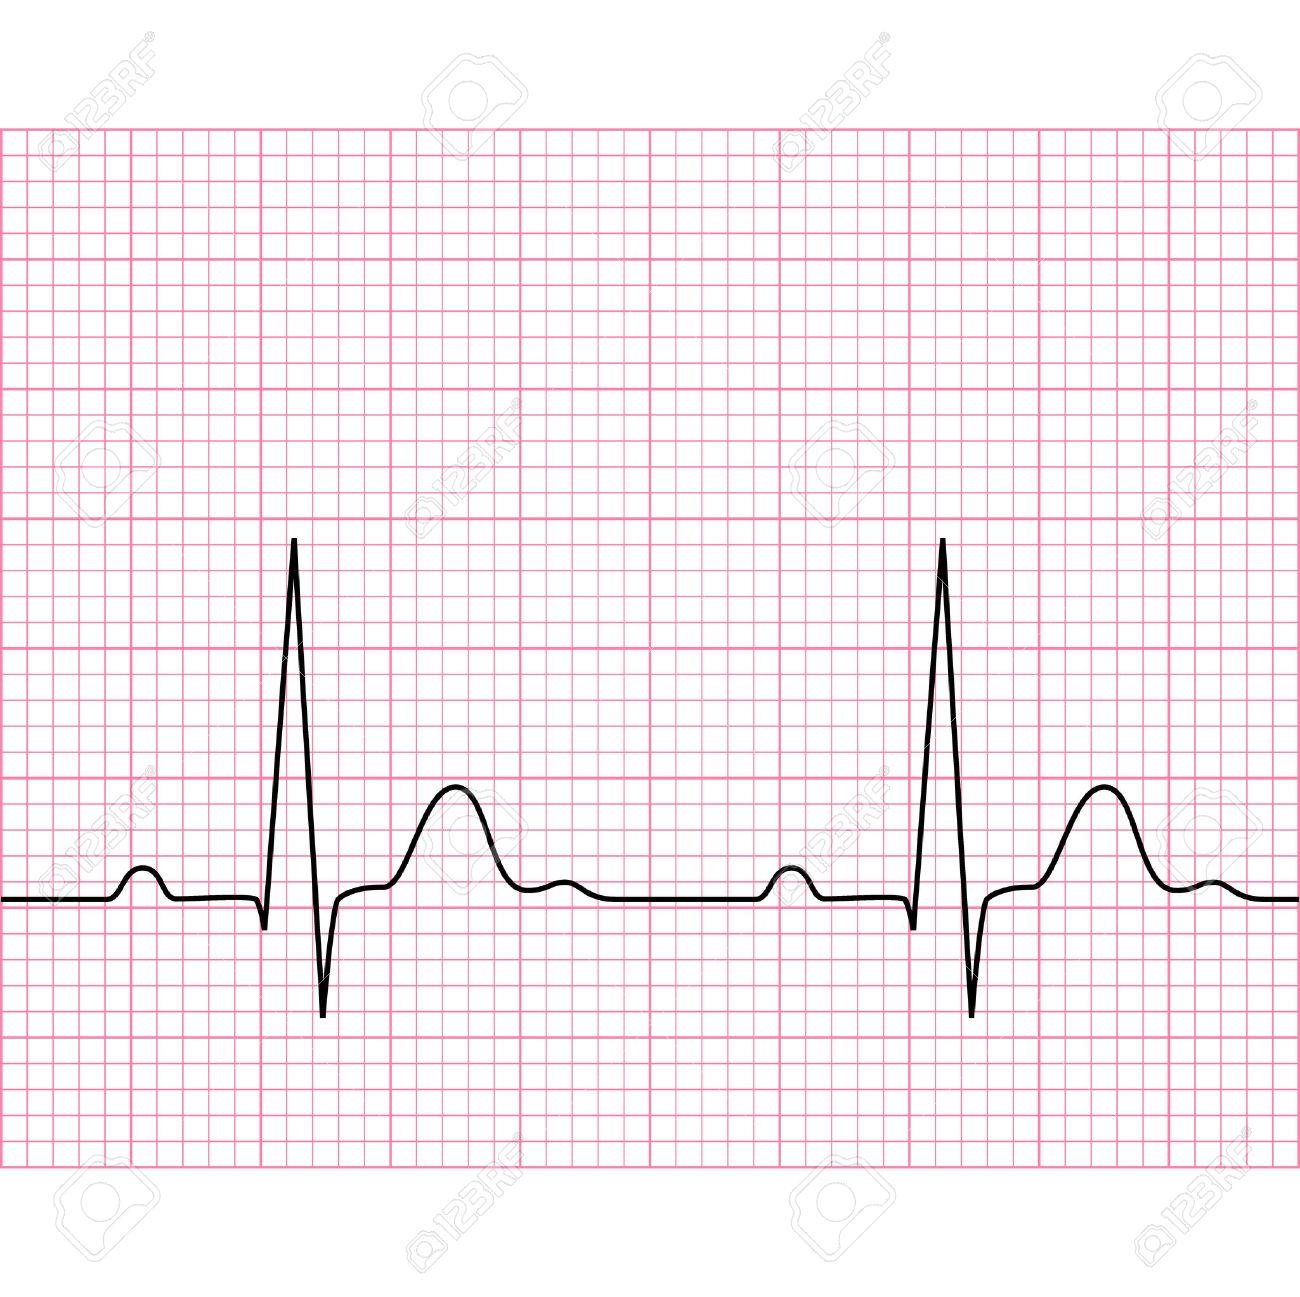 Illustration of medical electrocardiogram - ECG on chart paper, graph of heart rhythm, 2d illustration, vector, eps 8 - 32942824